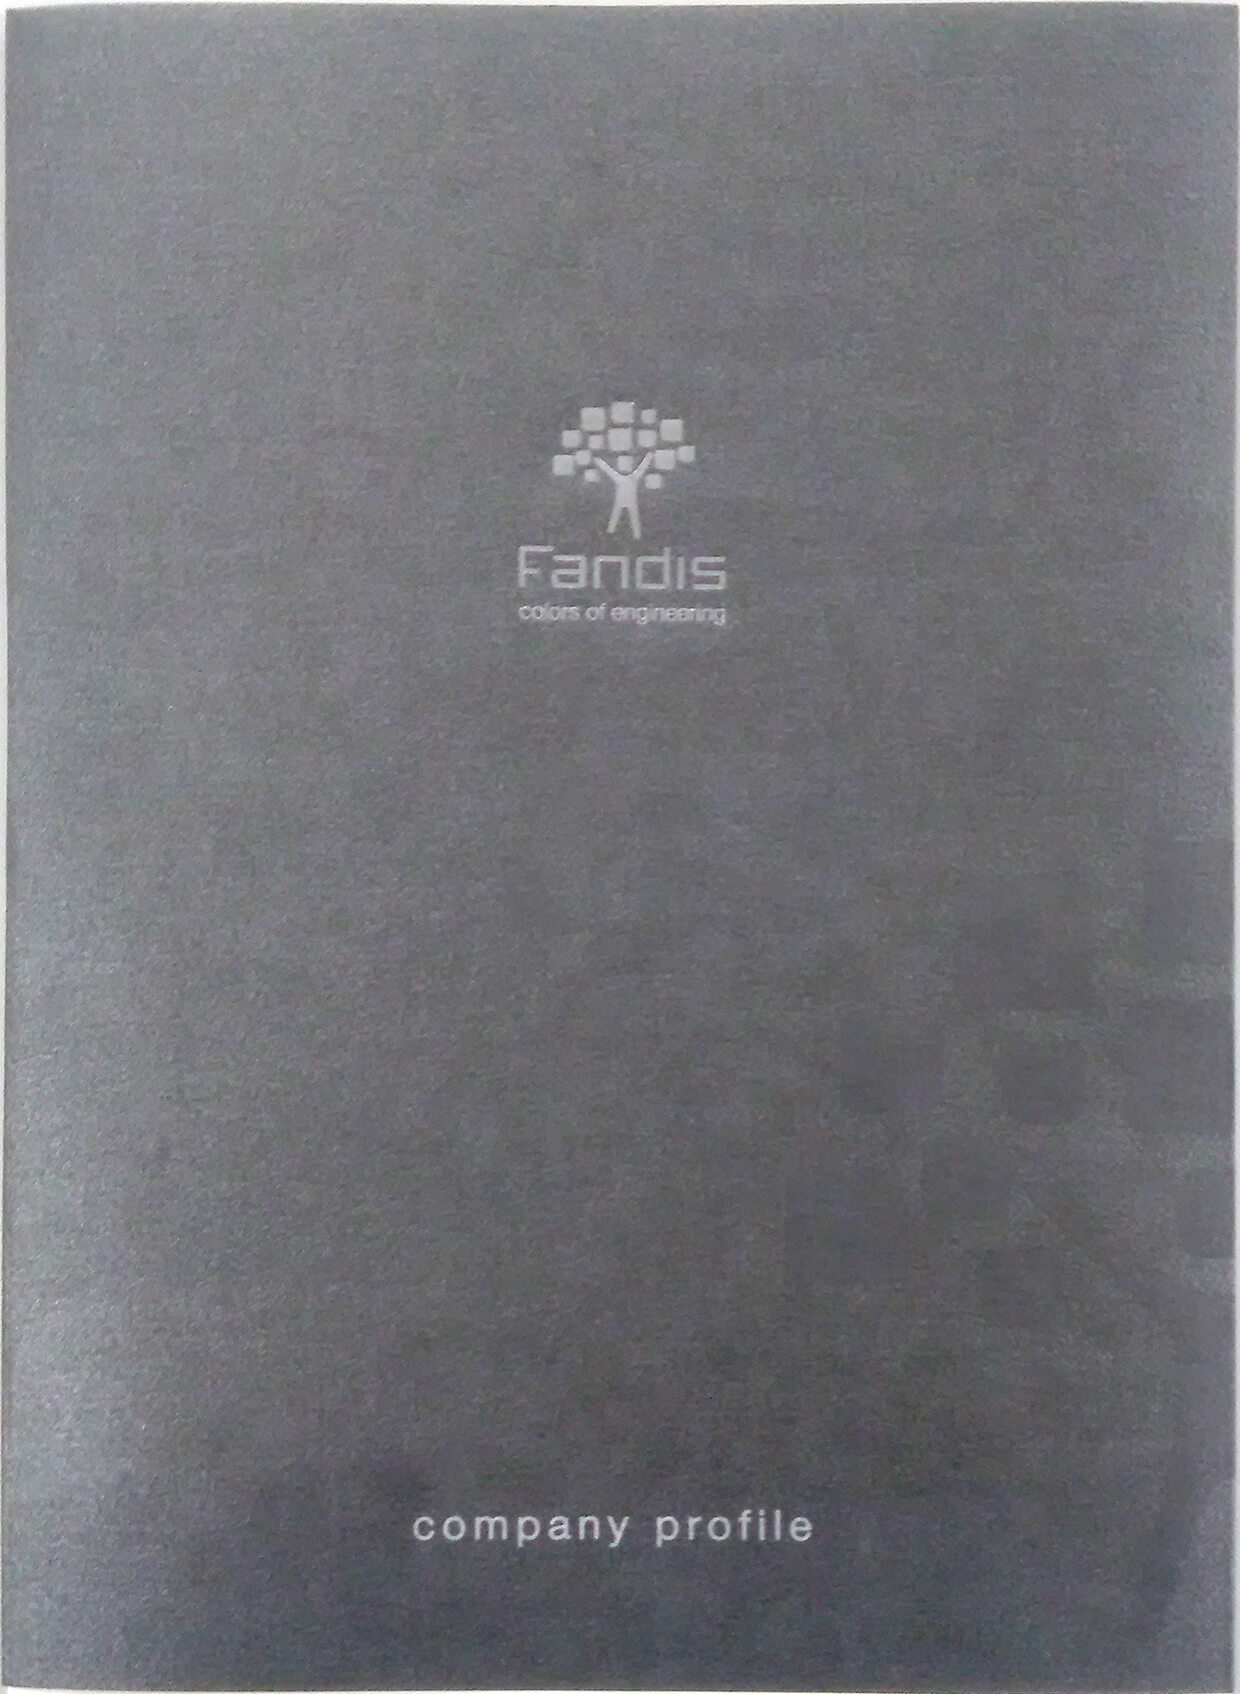 100 Company Profile